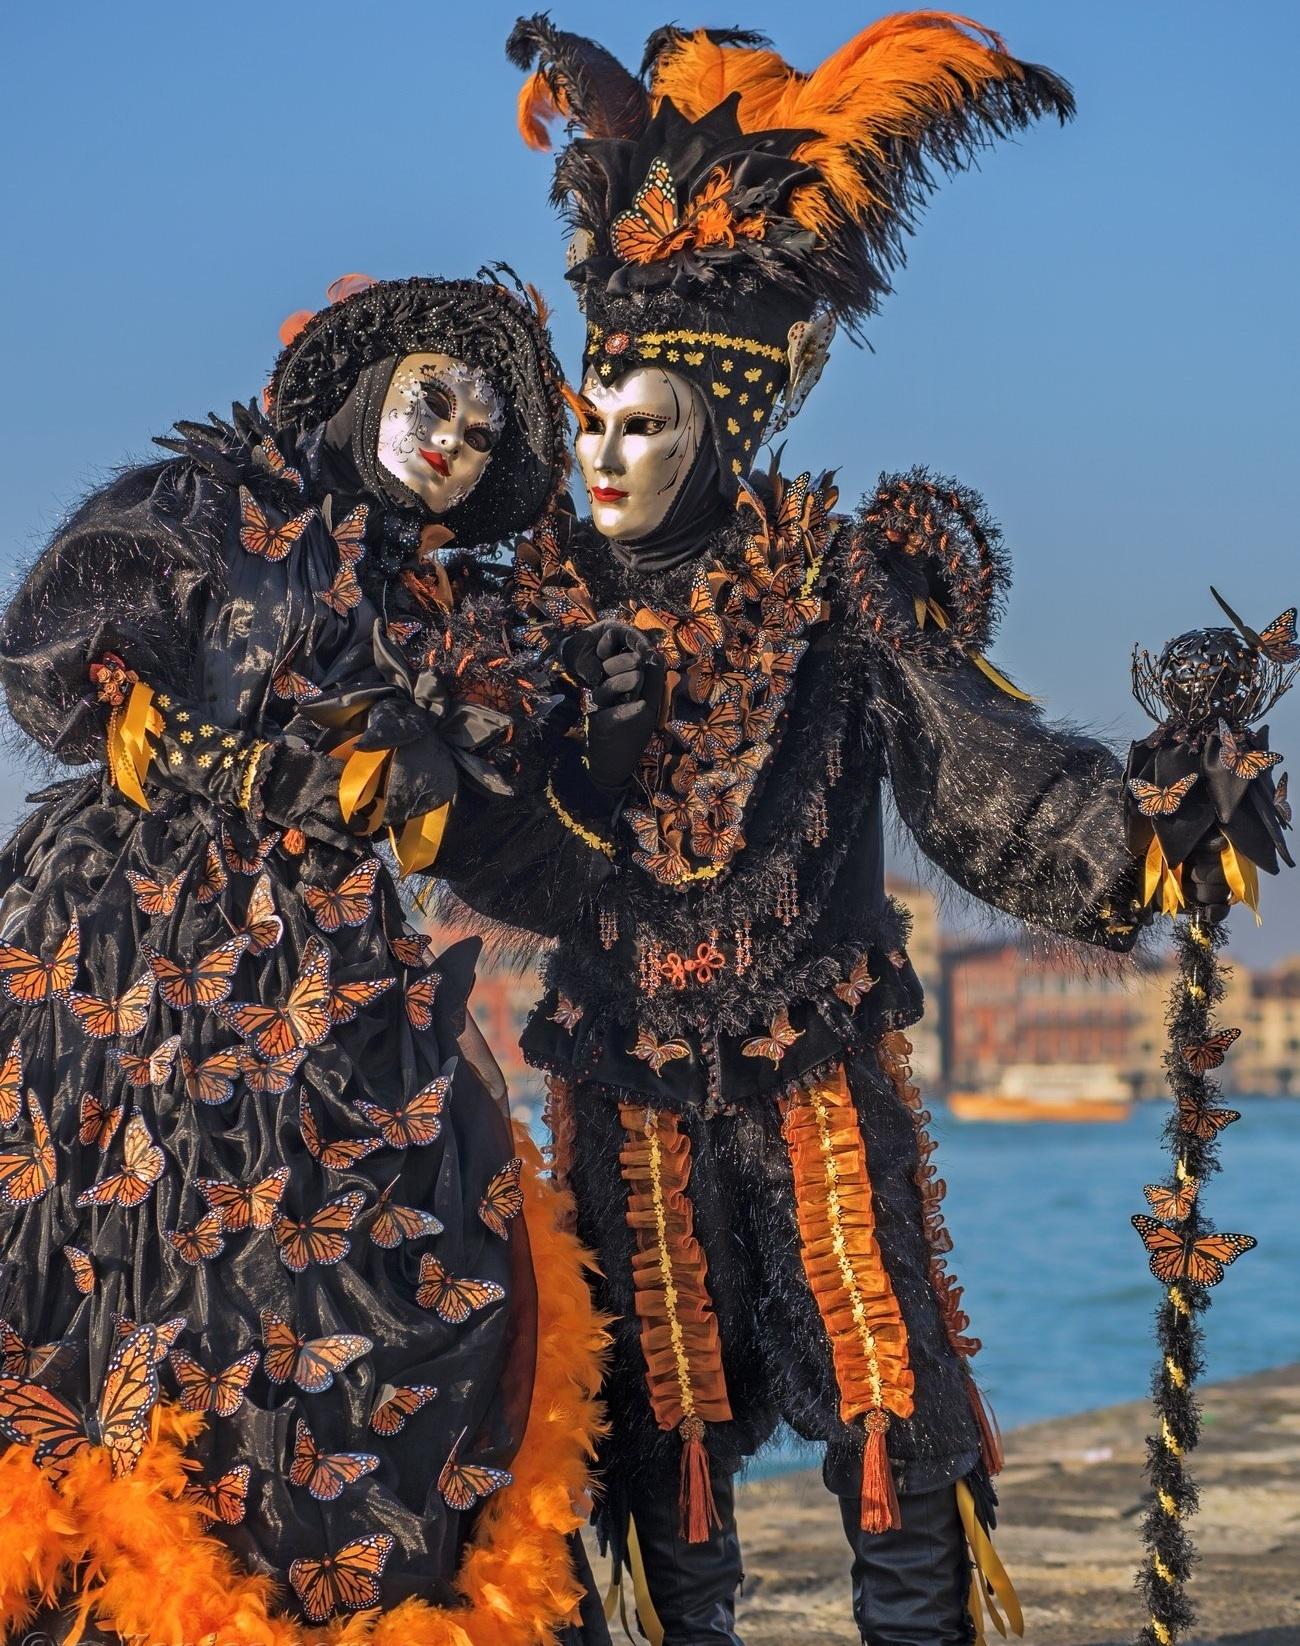 carnaval-venise-masque-costume-802.jpg